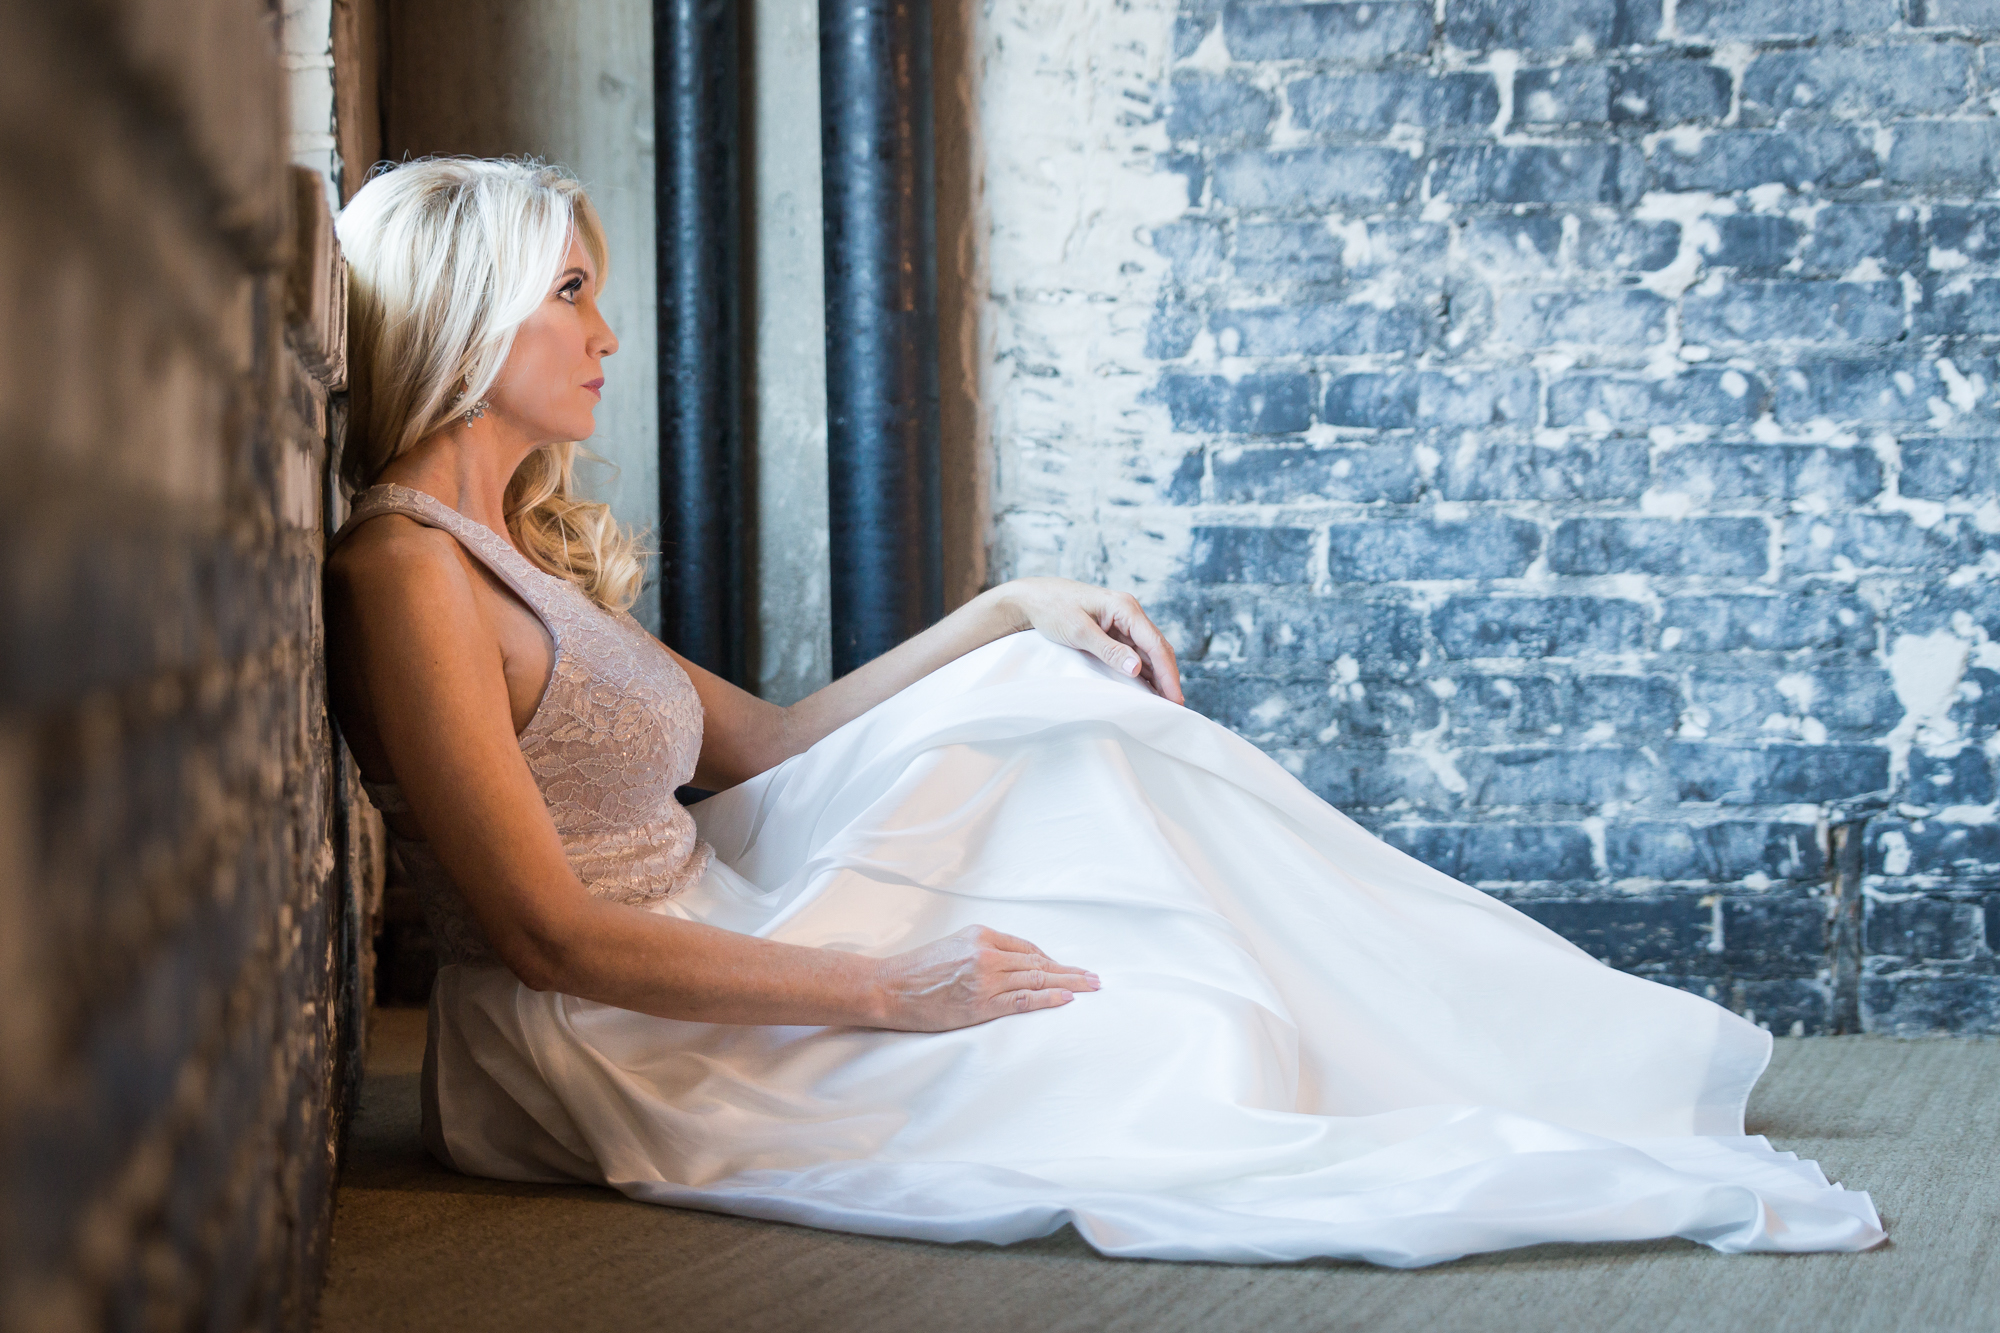 Oxford-Exchange-bride-photo, Tampa-wedding-photography